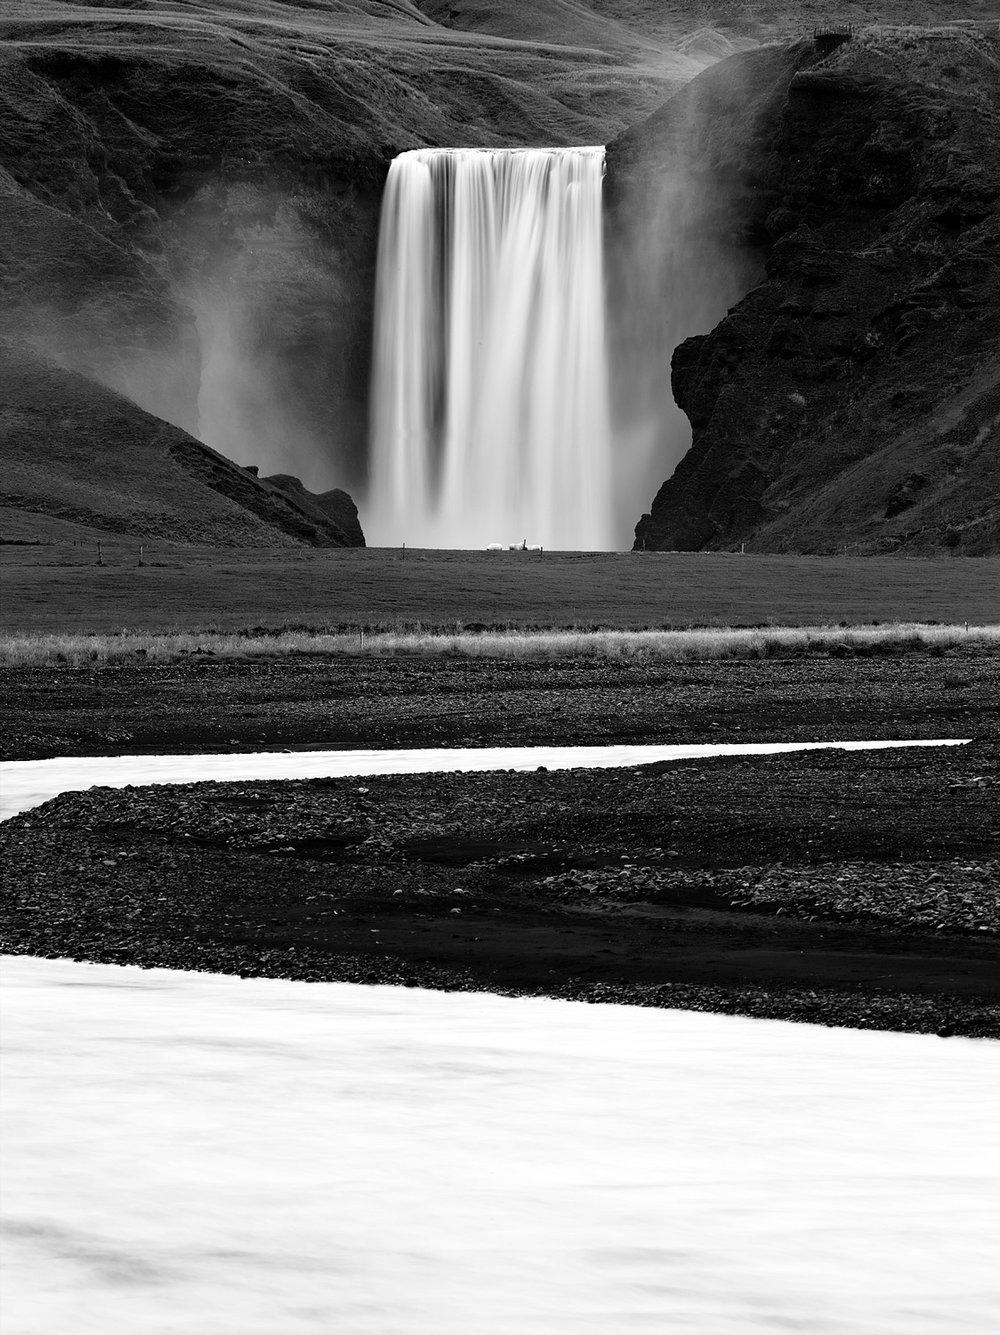 Skogafoss falls, Iceland 2014